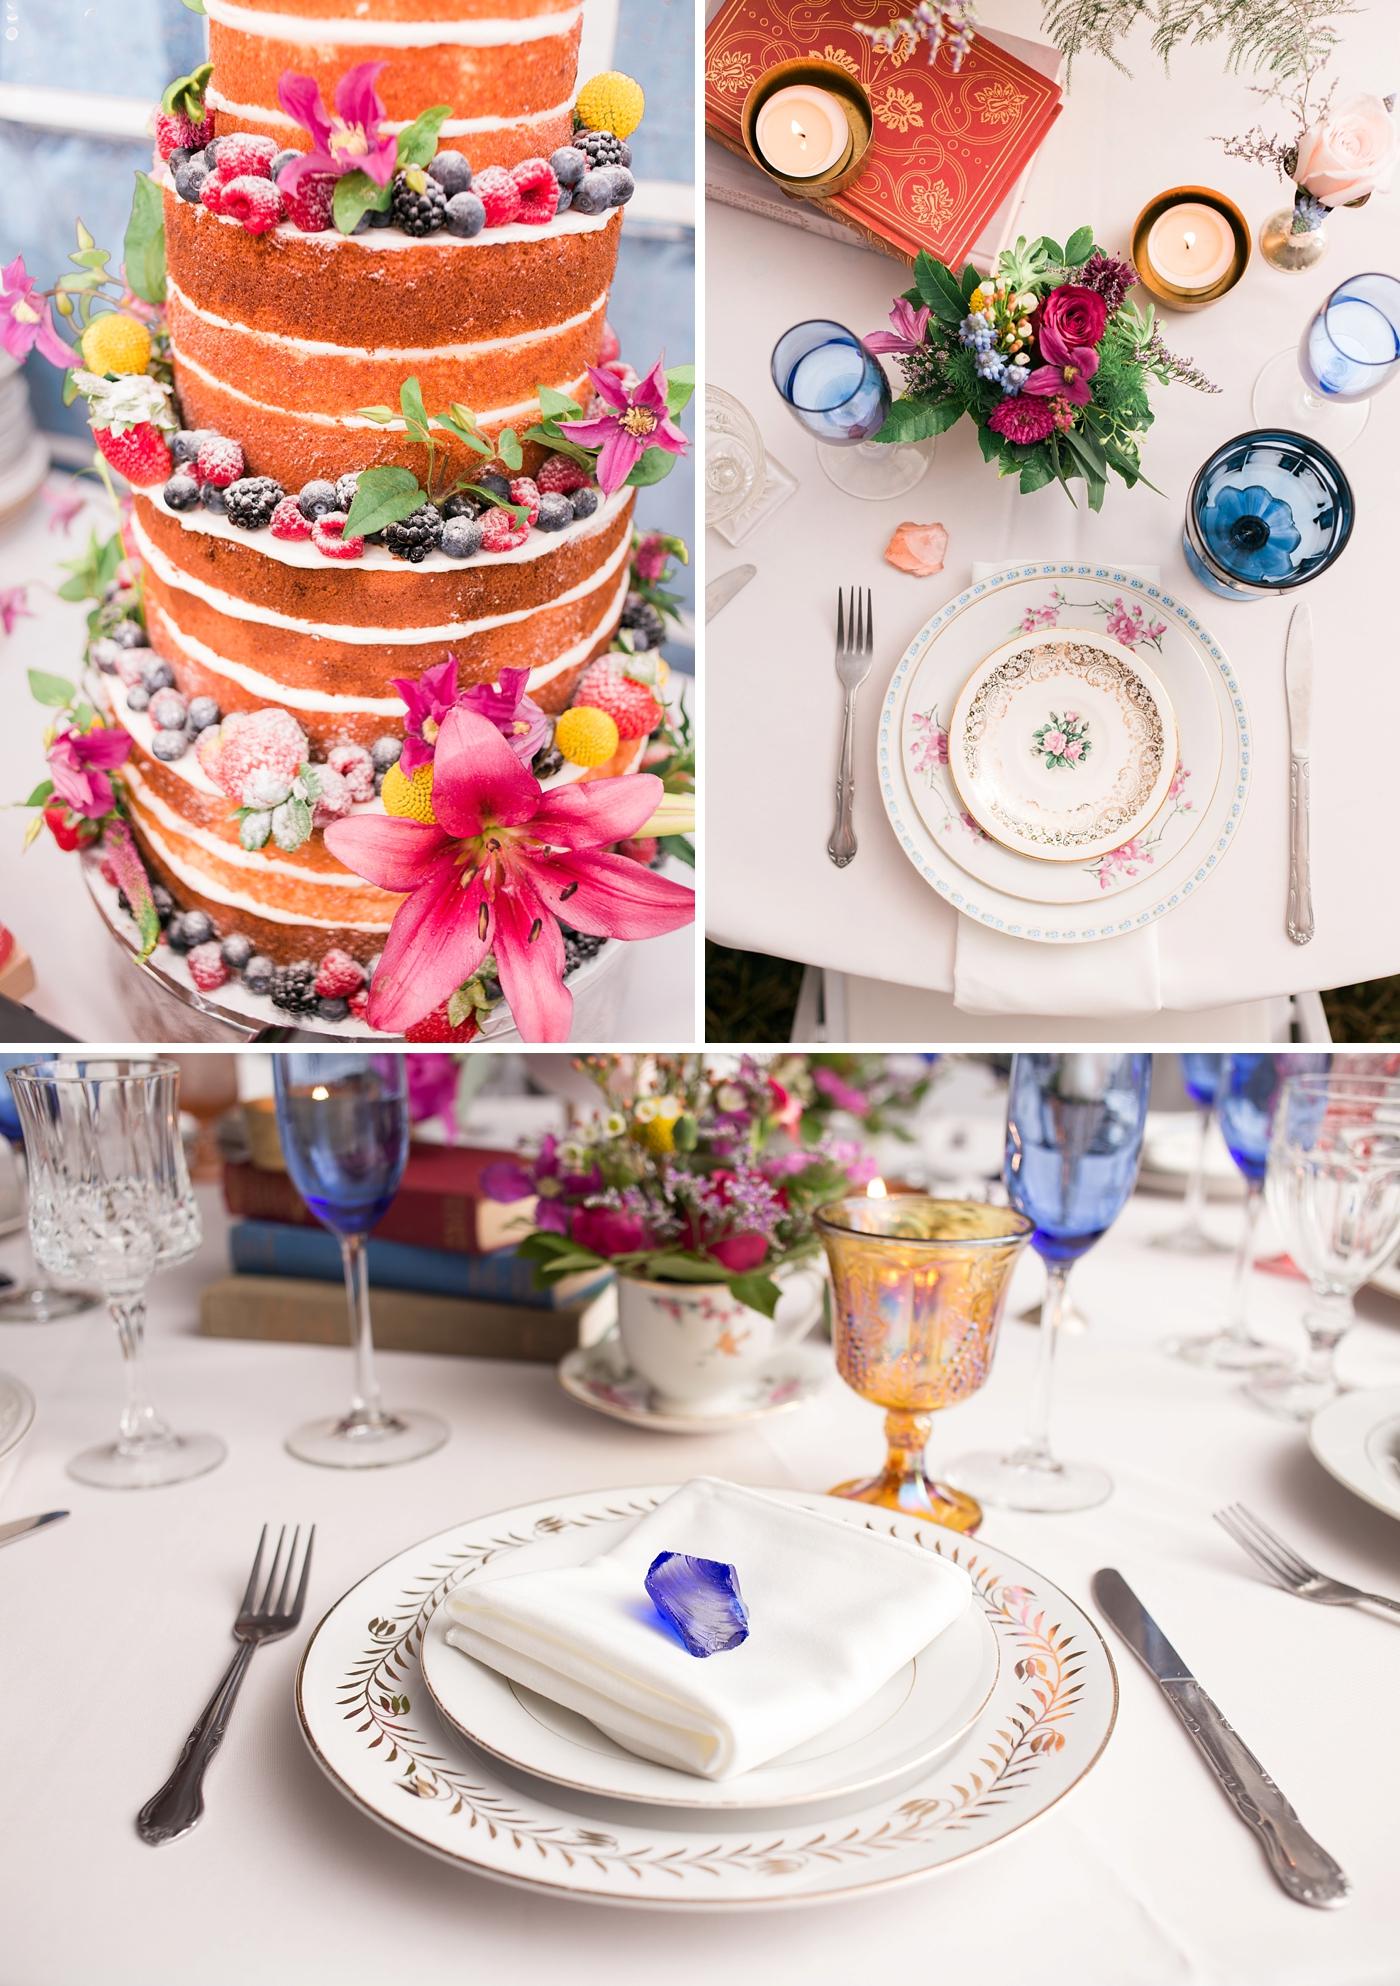 orlando-wedding-photography-justin-gilbert-tampa-sunken-gardens_0010.jpg